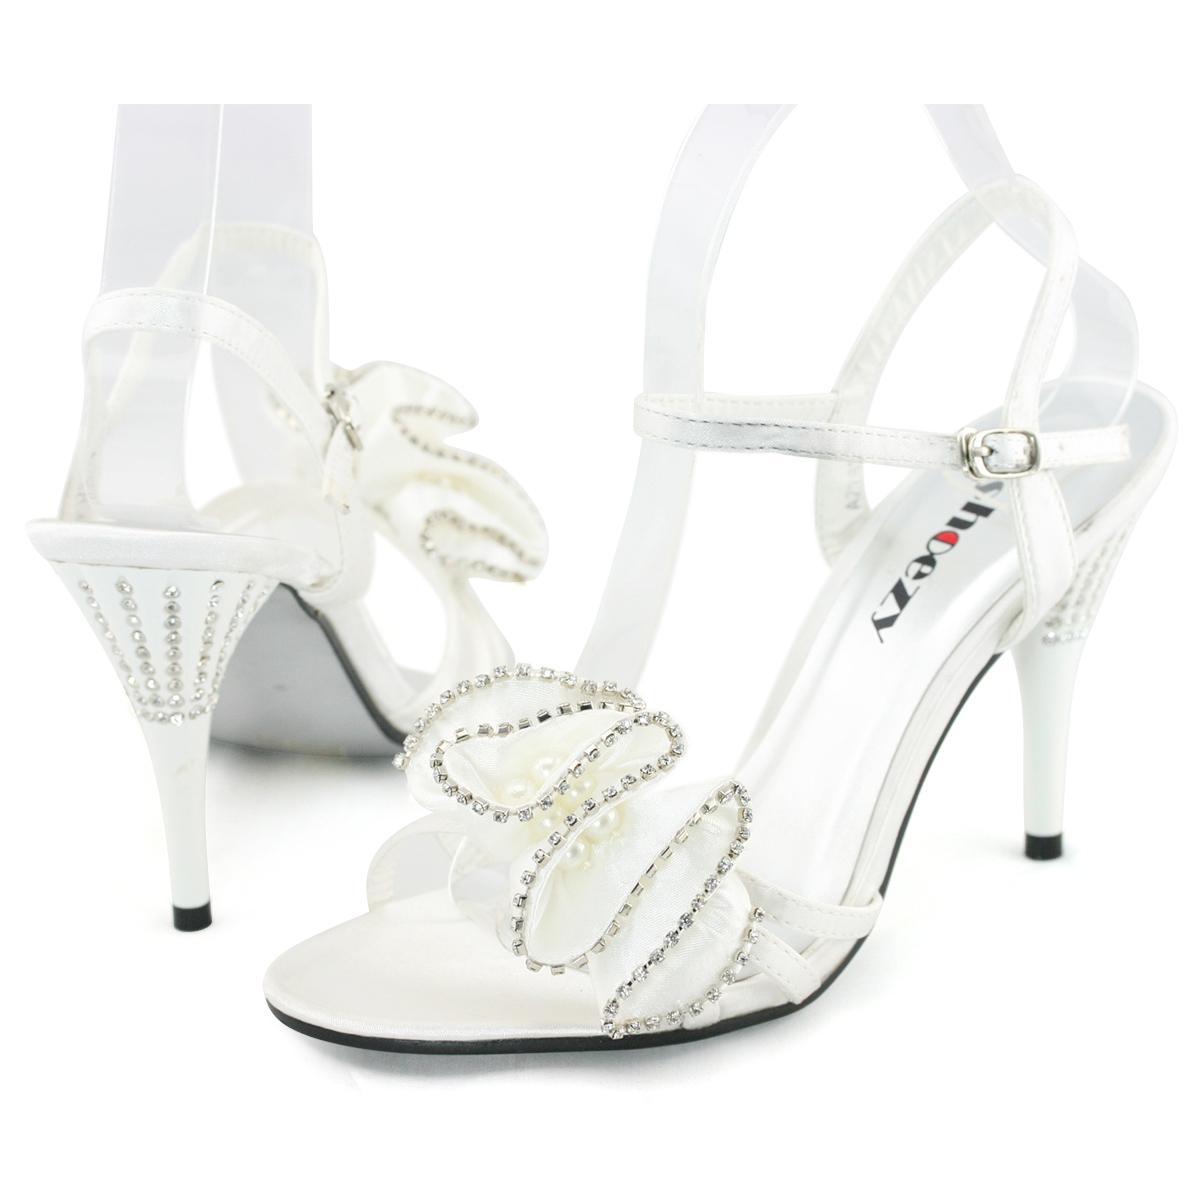 SHOEZY-womens-flower-diamante-formal-wedding-prom-dresses-peep-toes-heels-shoes